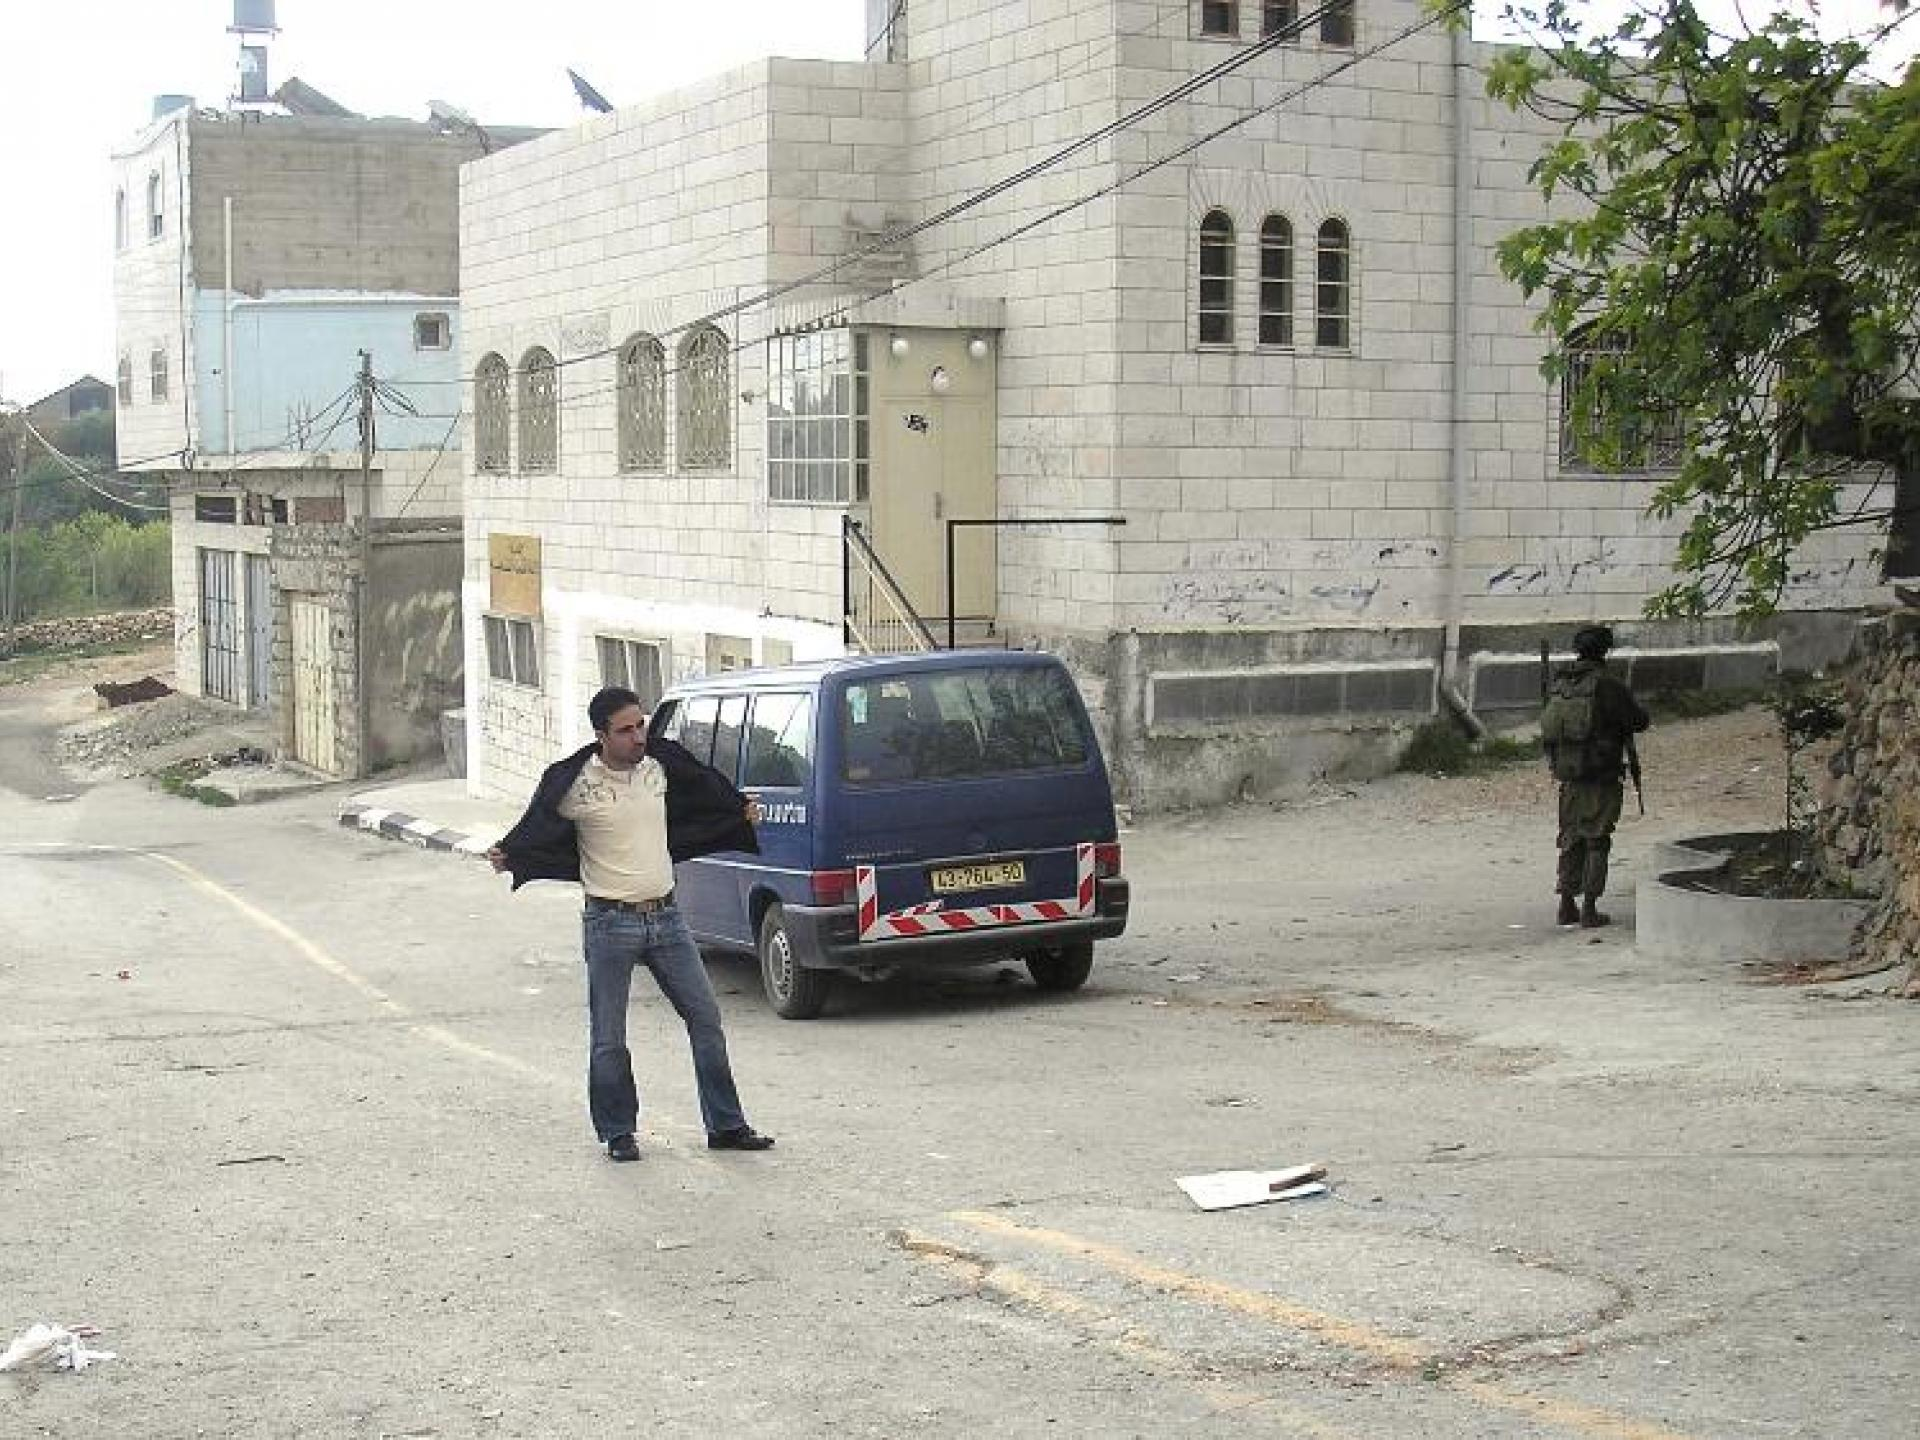 Hebron 01.04.08